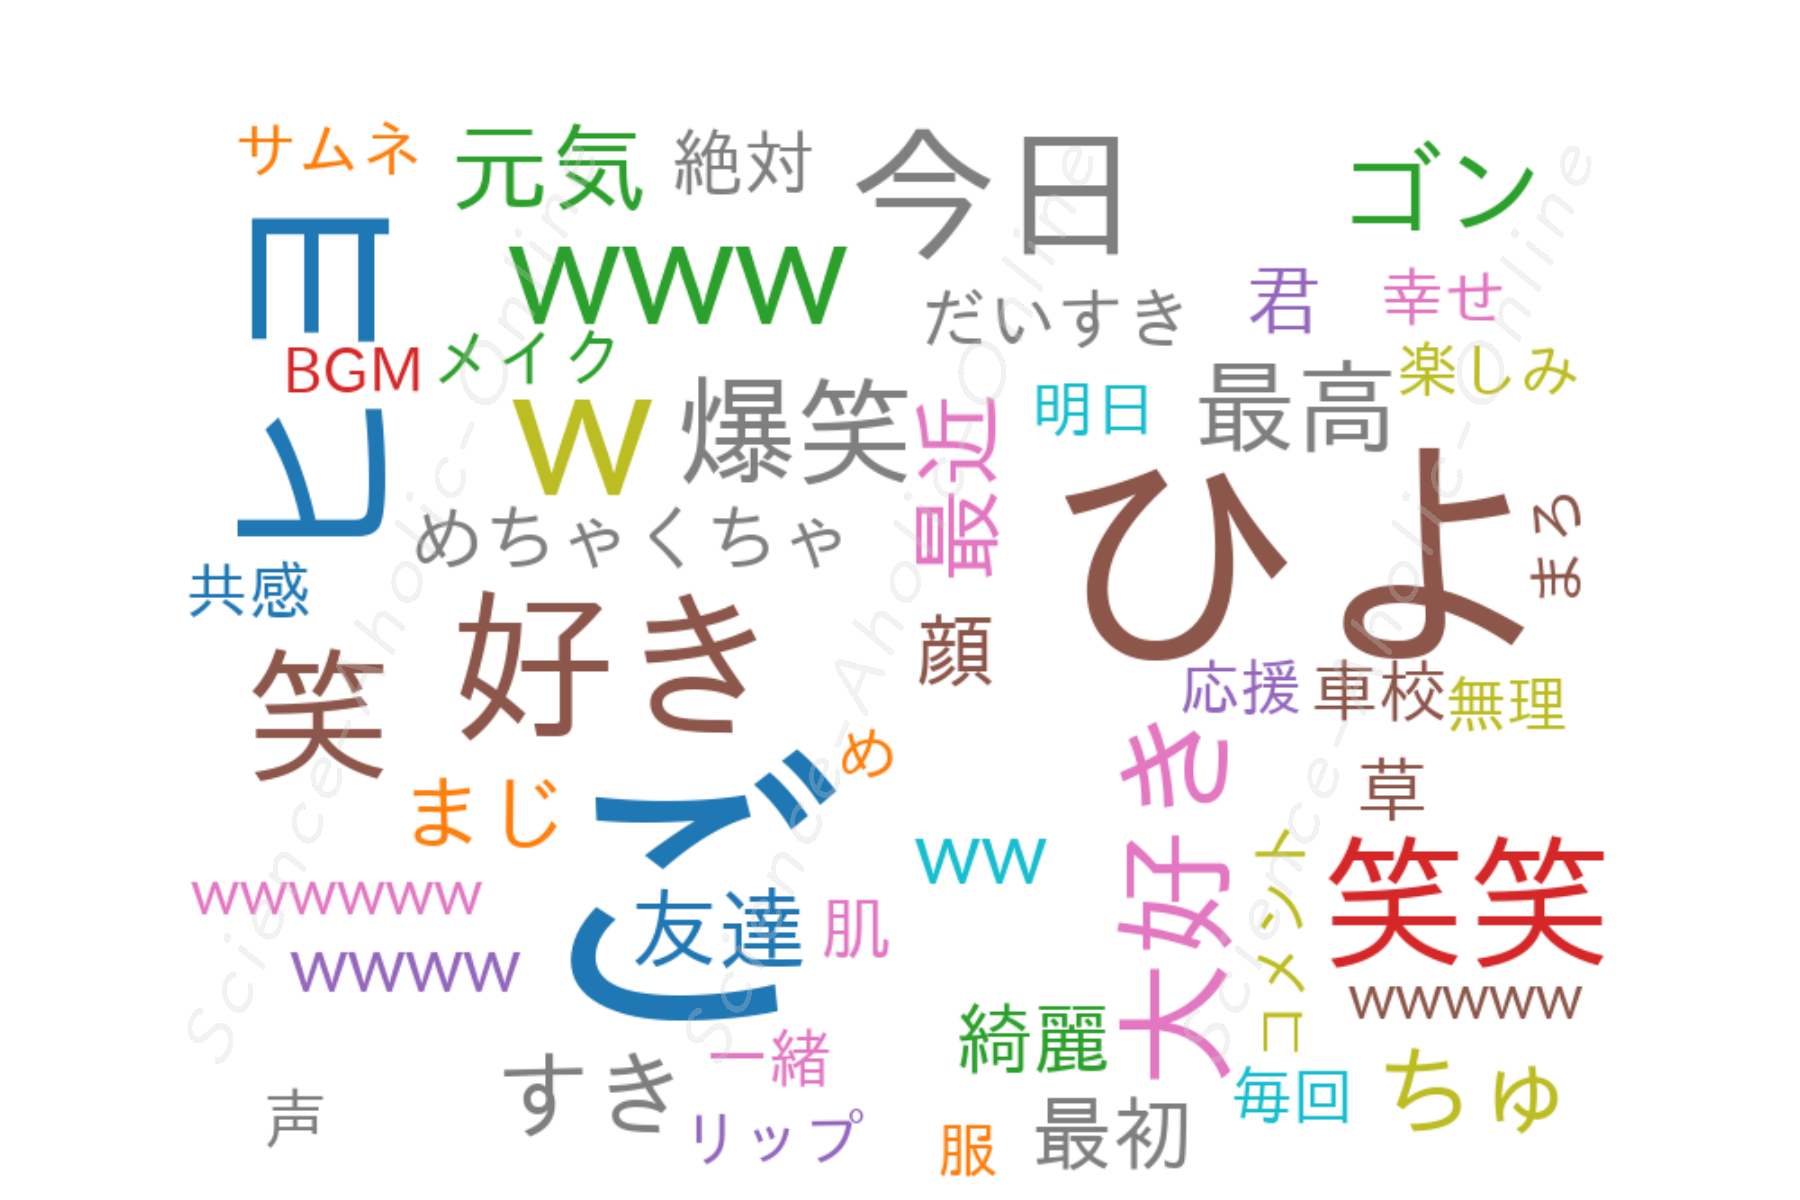 https://science-aholic-online.com/wp-content/uploads/2020/08/wordcloud_ヒヨごん.png